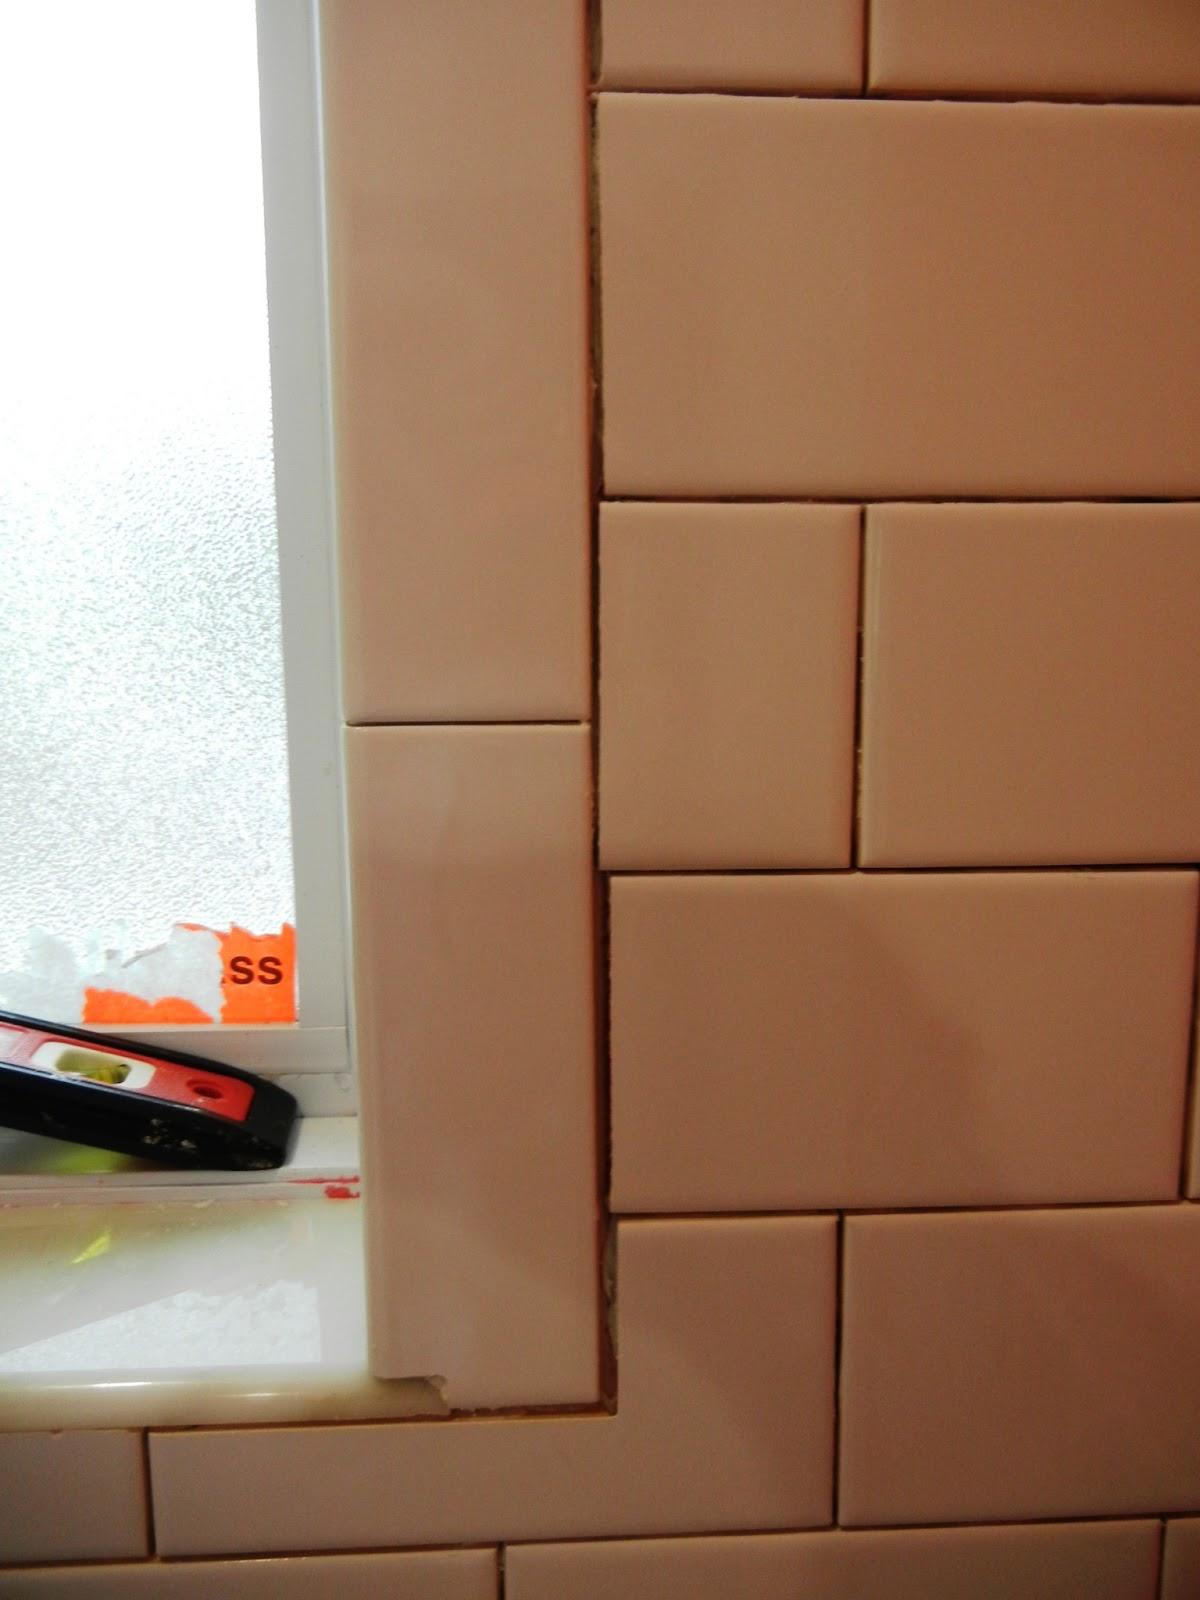 It's Not Rocket Science: Subway tile!